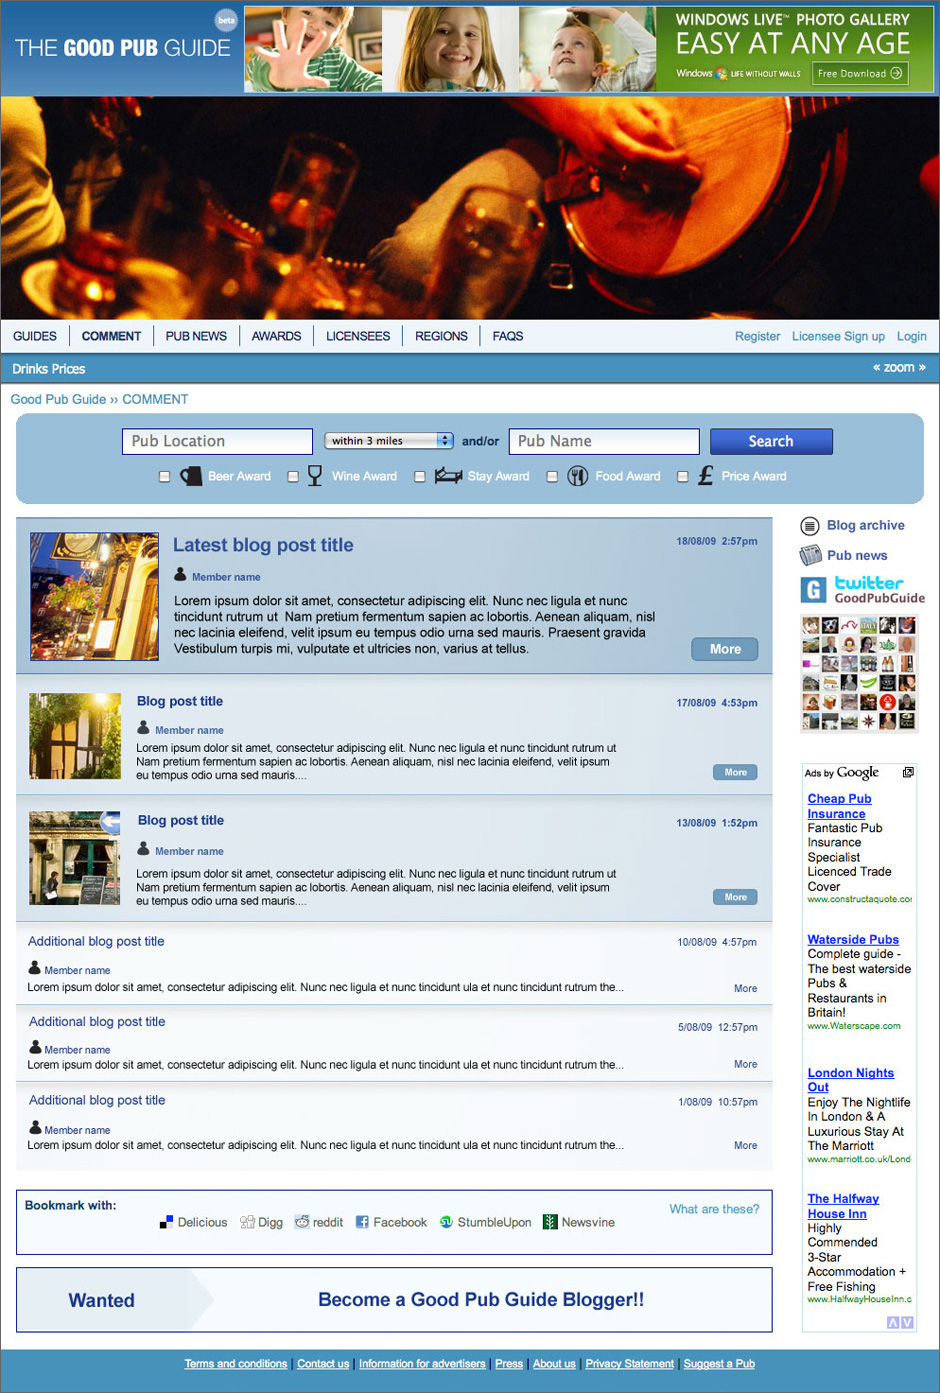 Good Pub Guide Blog Comment Visual